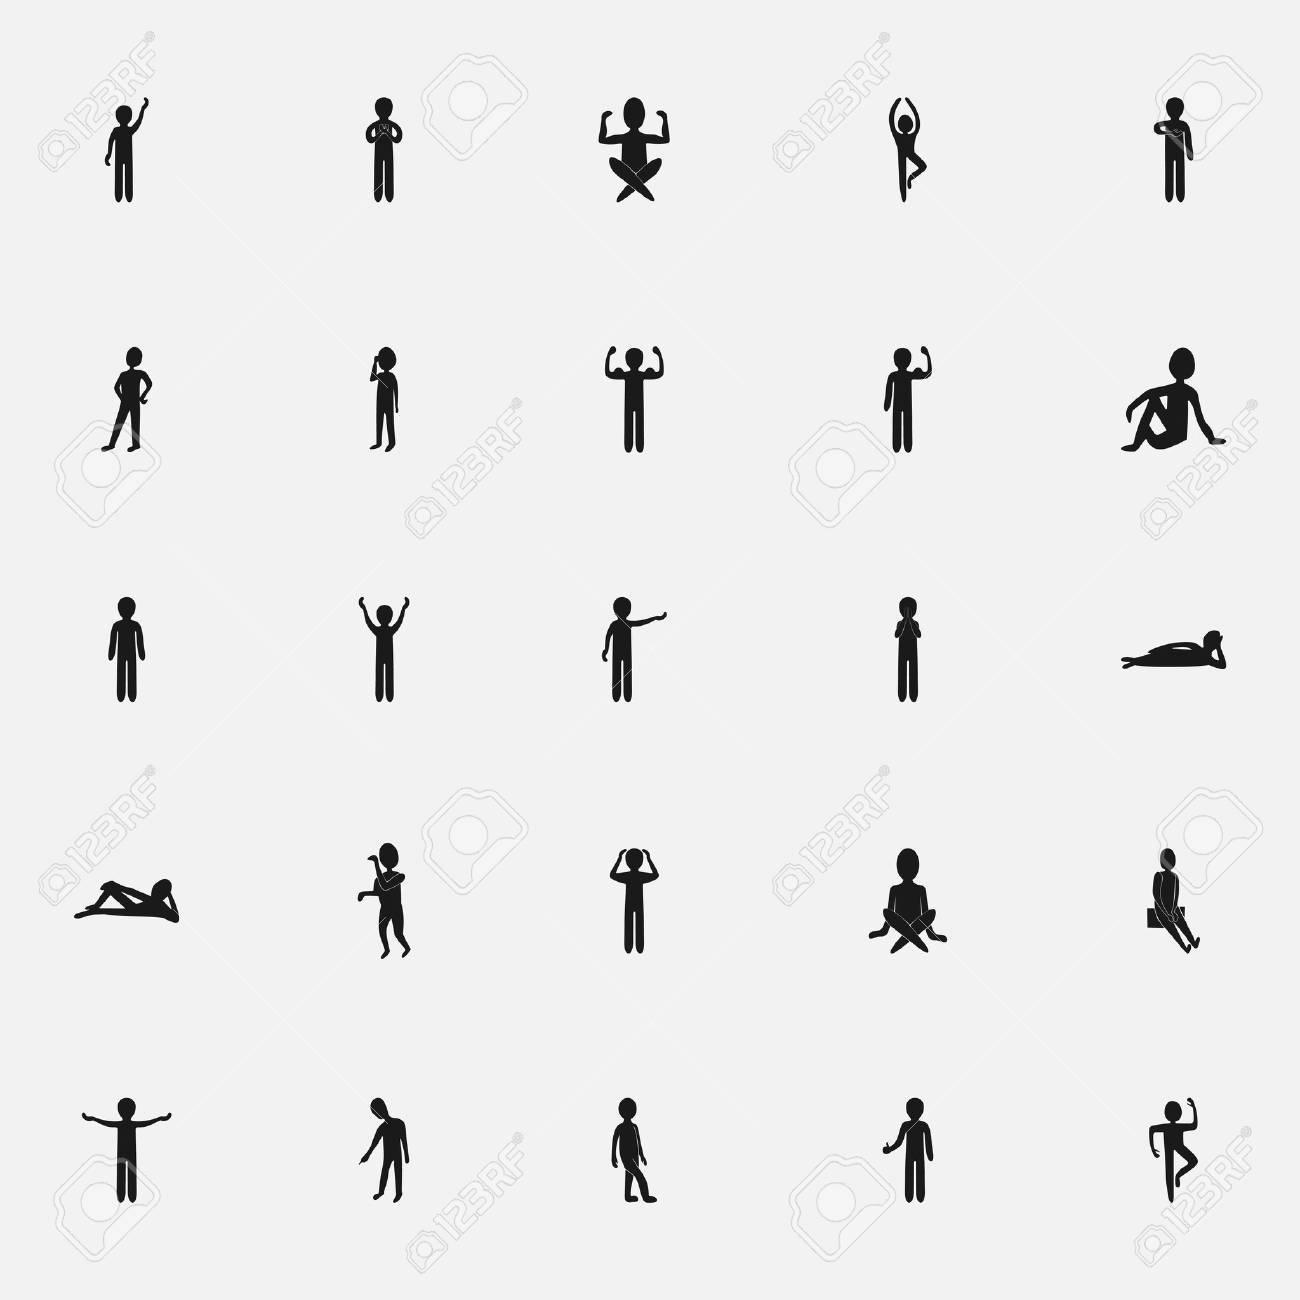 black icon stick figure on a white background flat style - 53277618